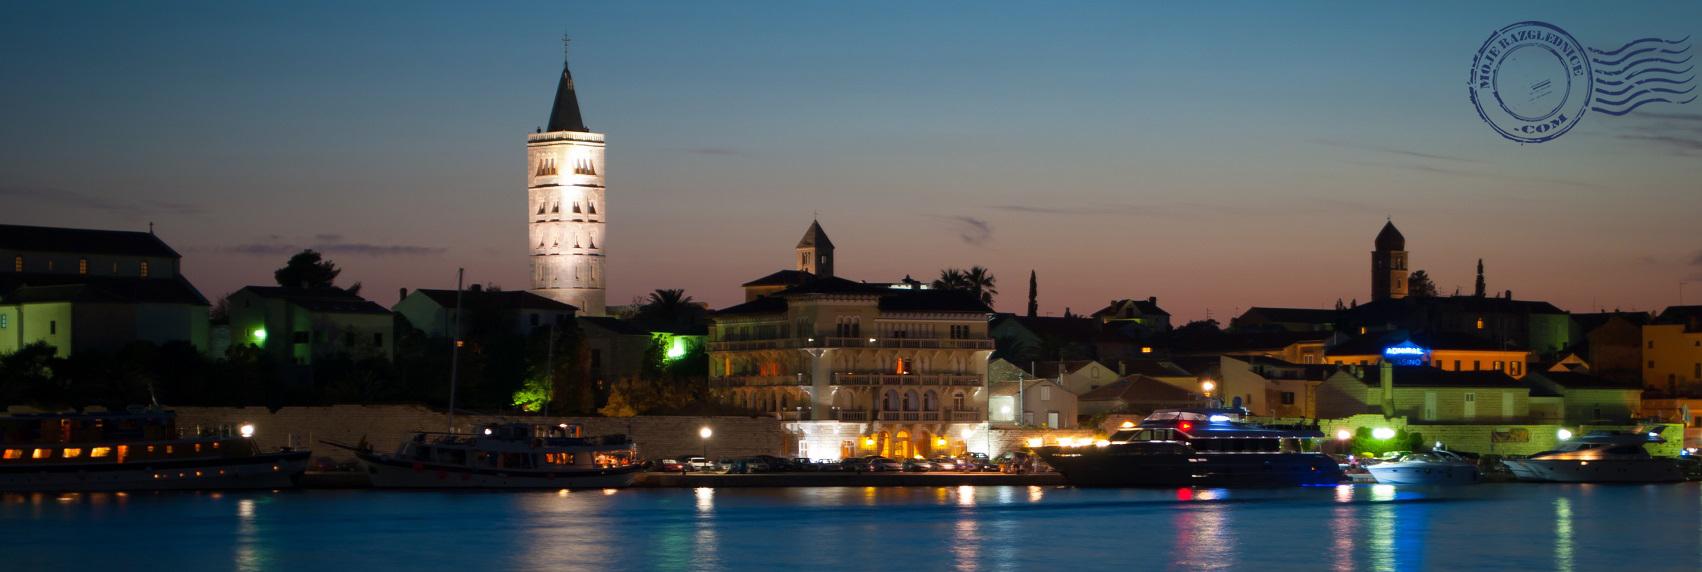 Otok Rab panorama noćna slika